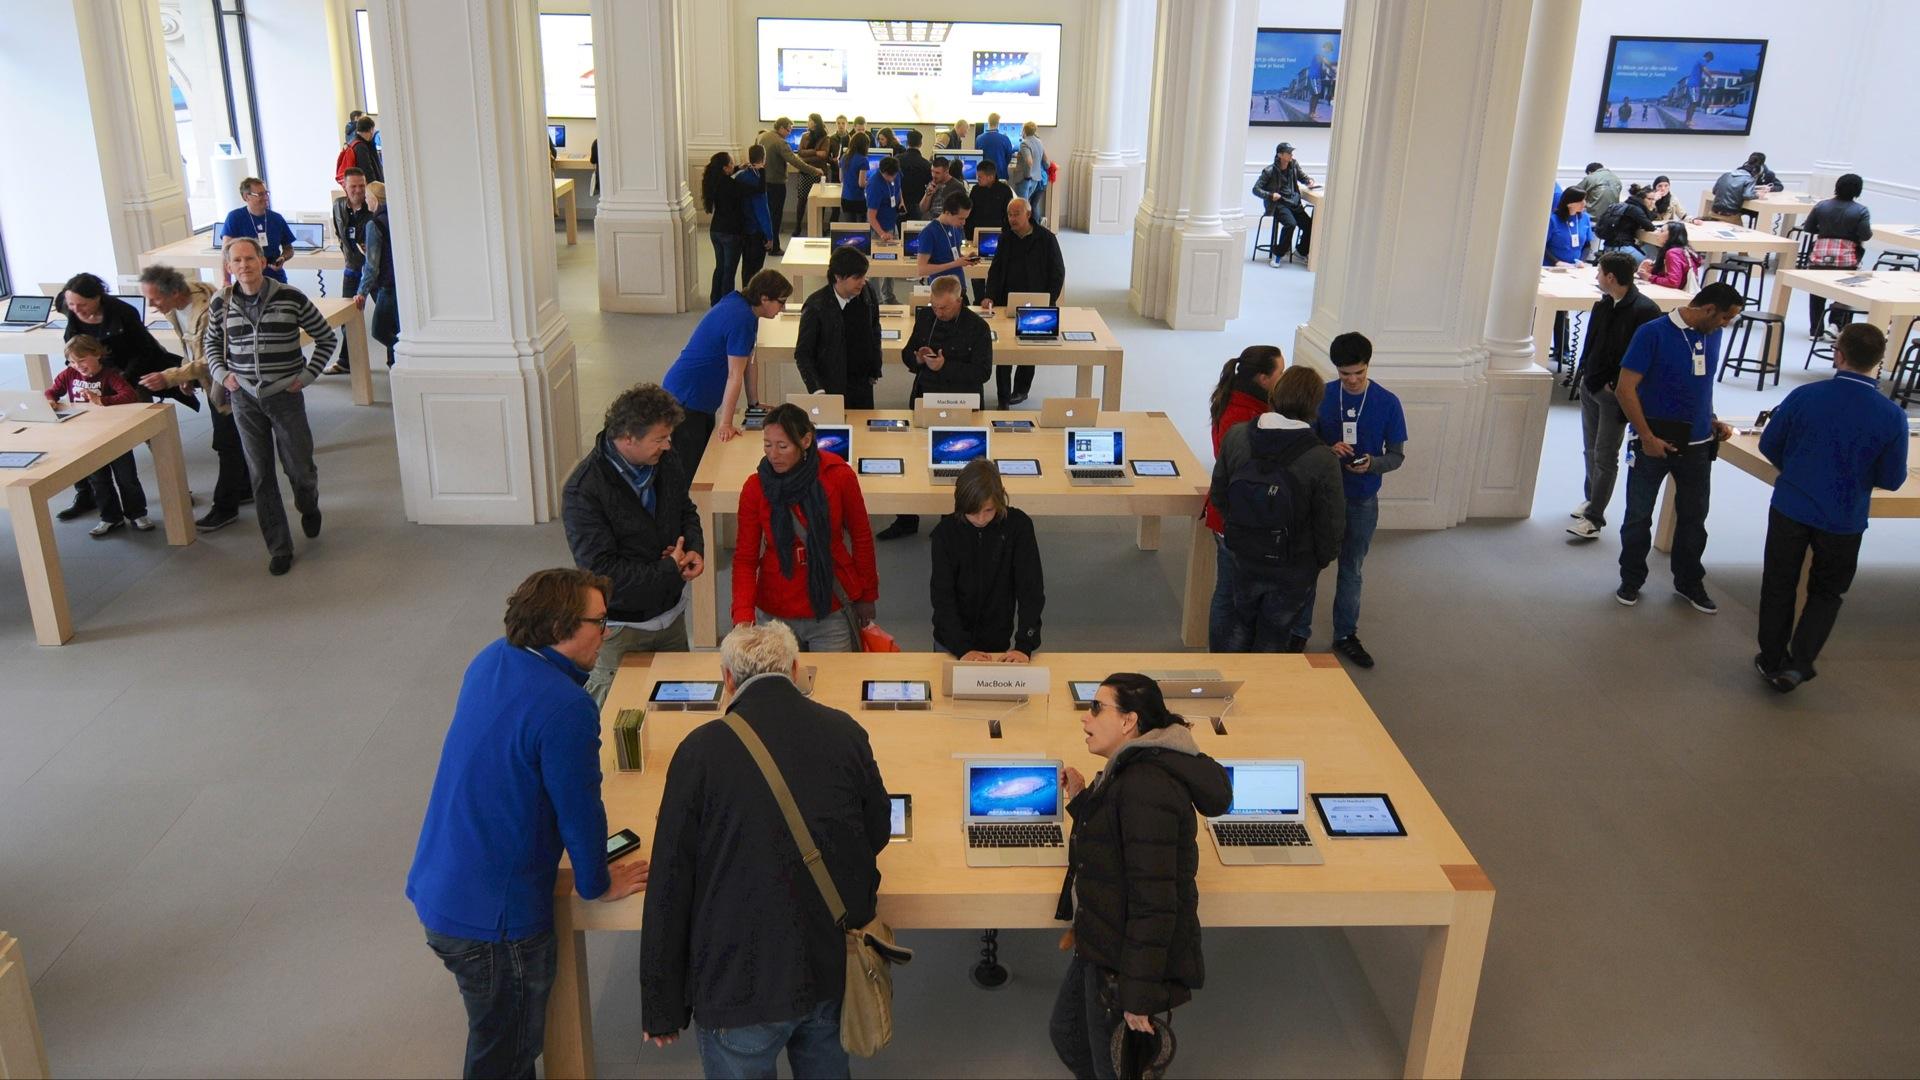 020-apple-store-16x9